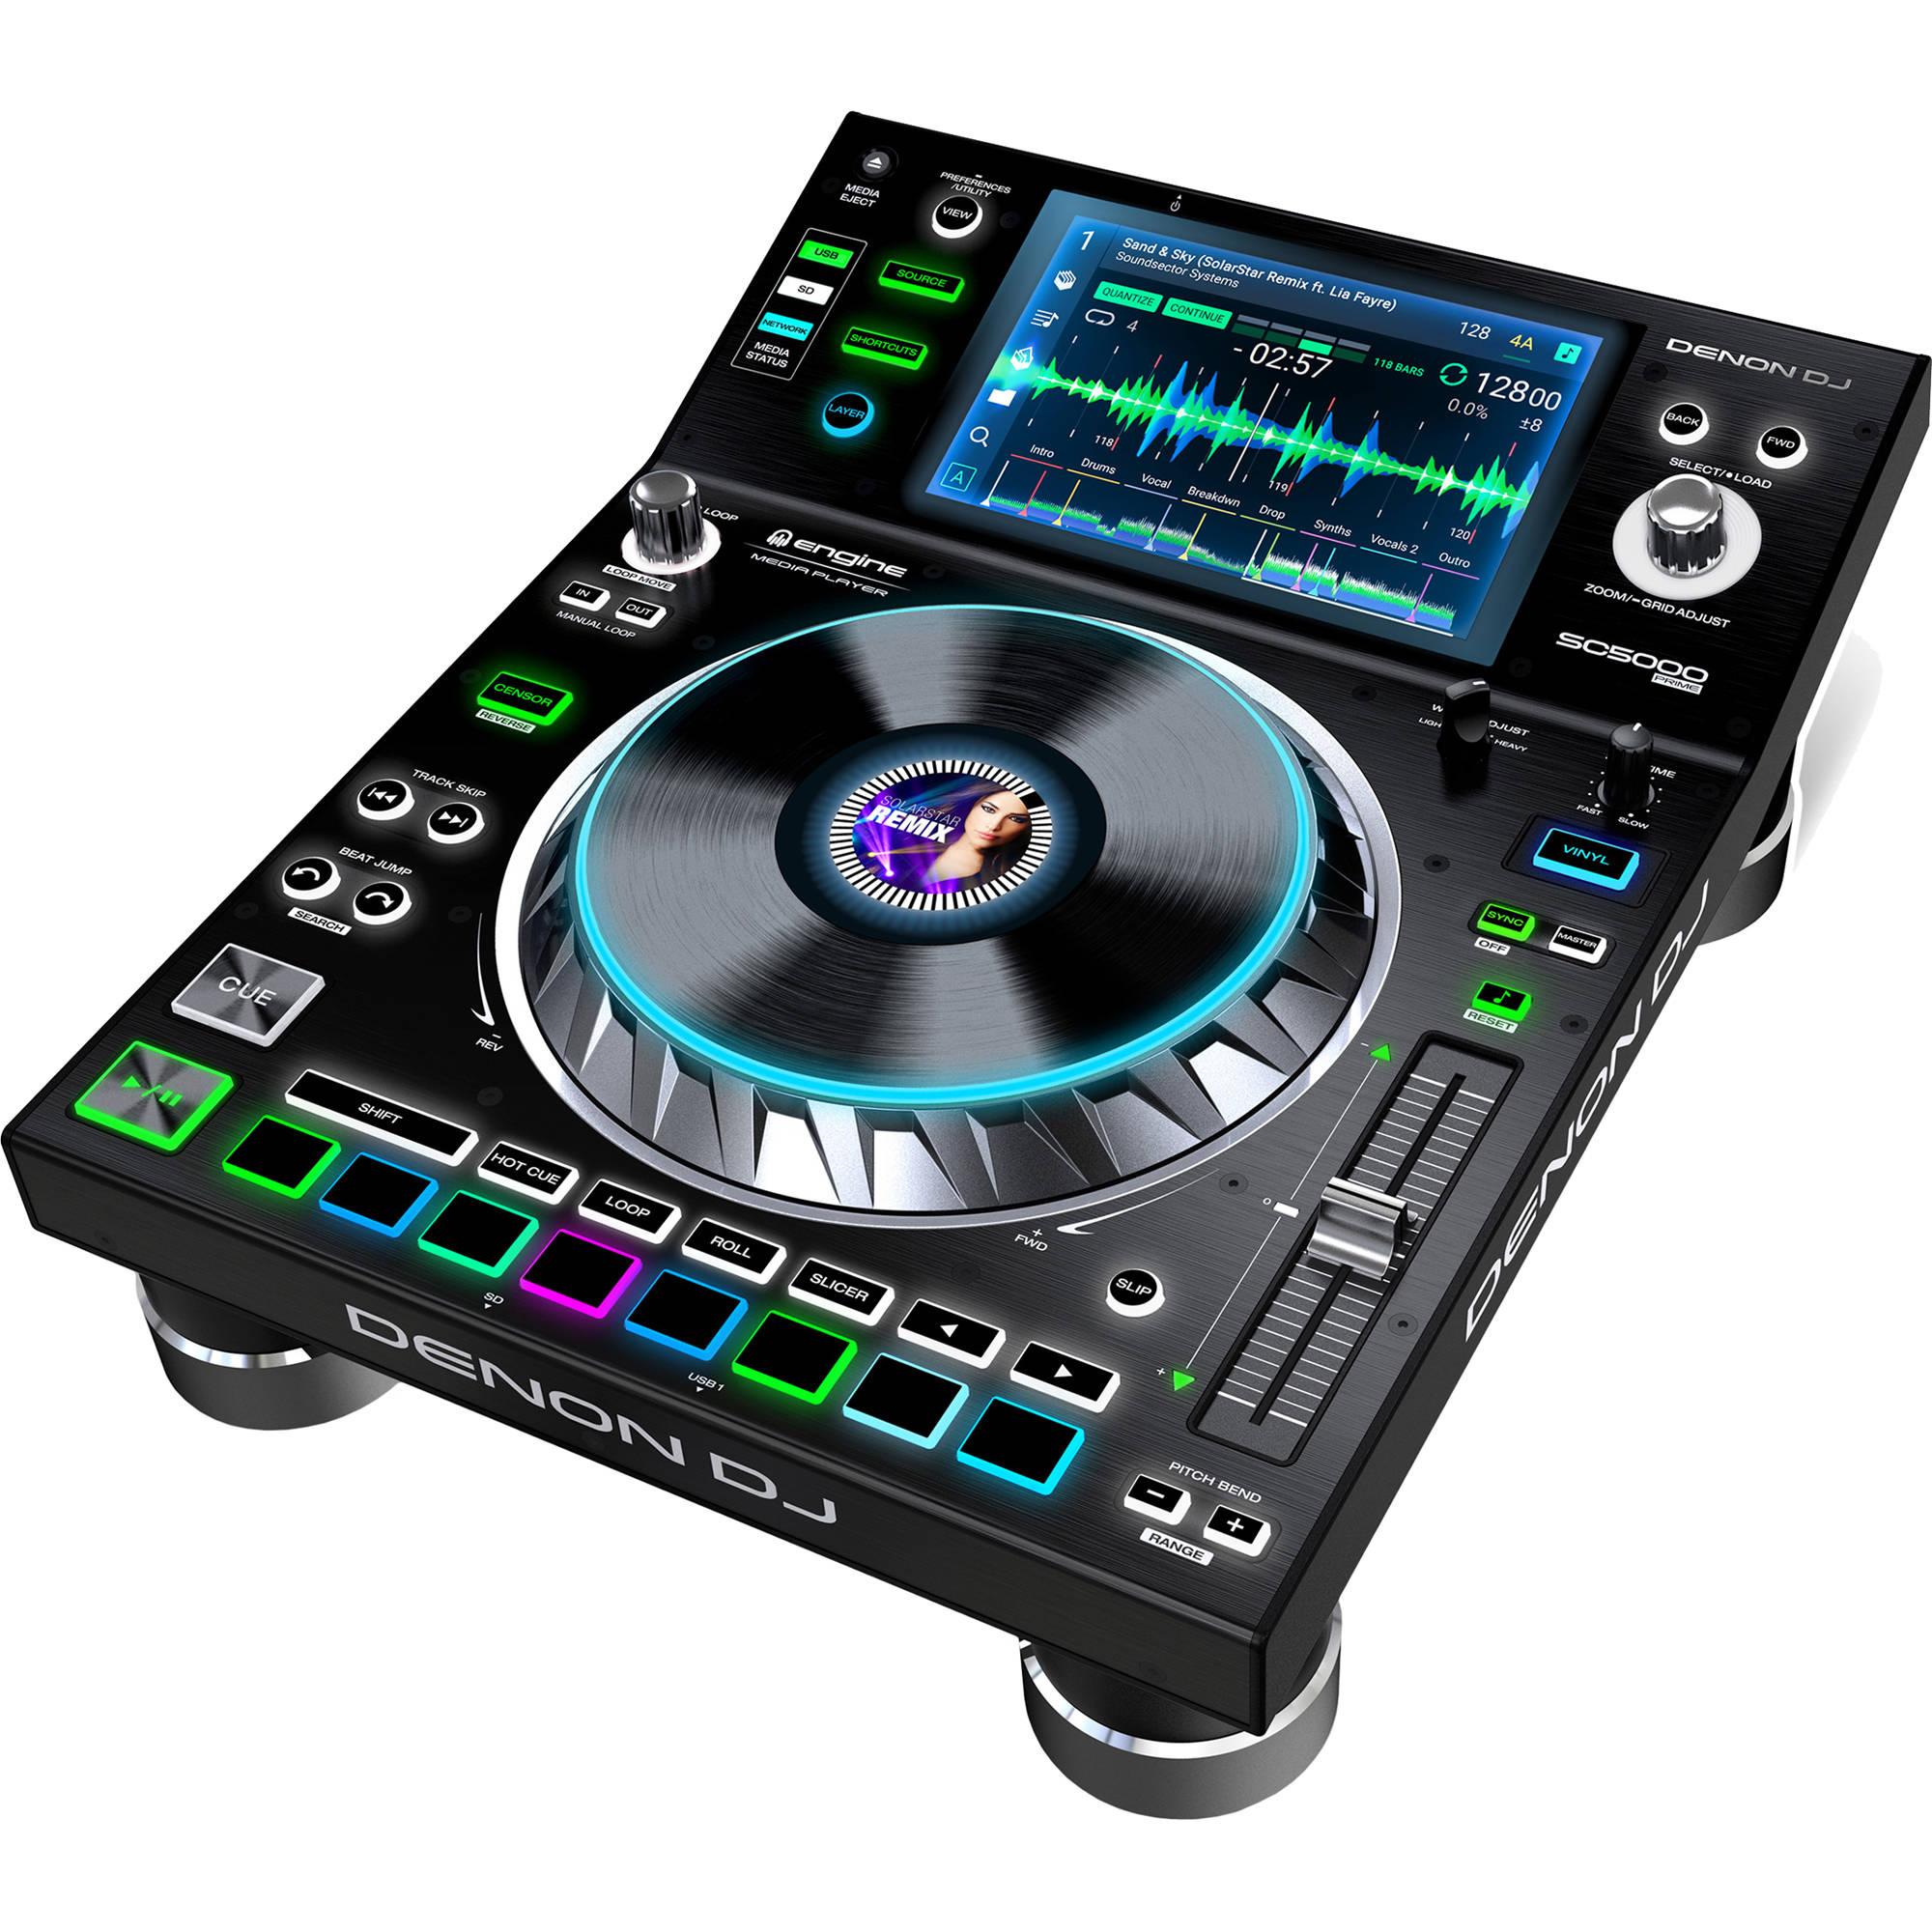 Clip dj converter video to mp3